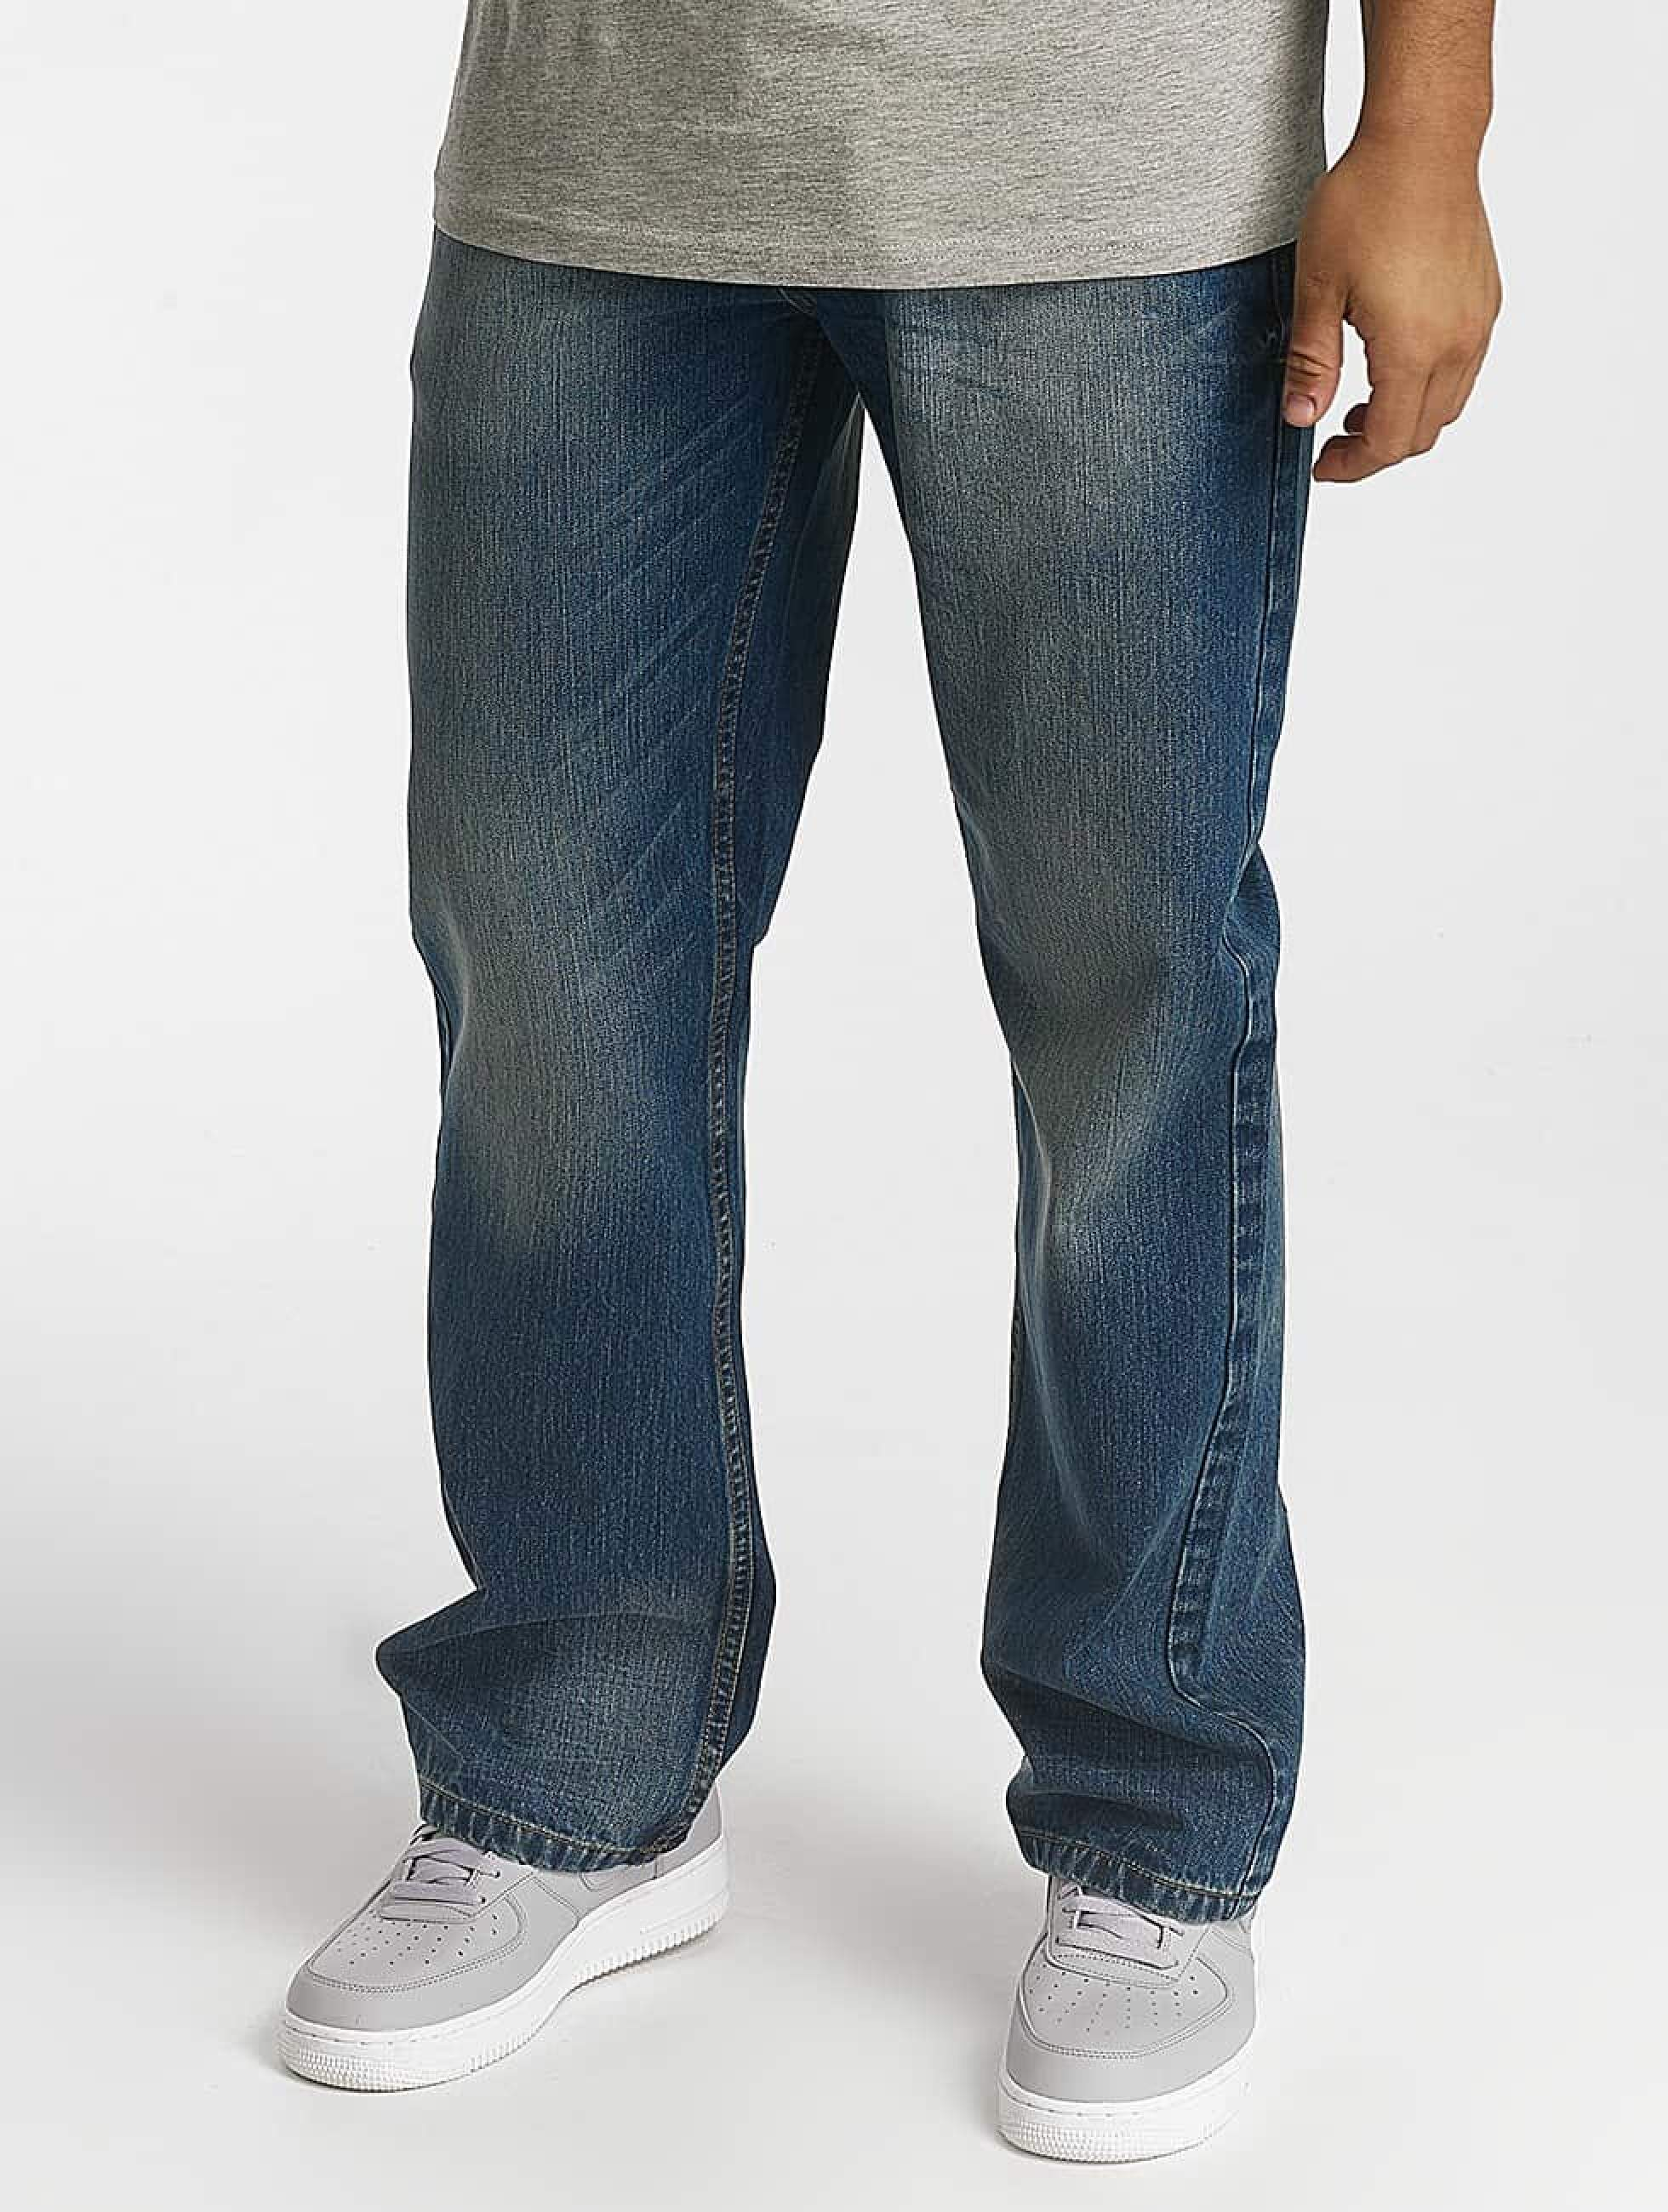 Rocawear / Loose Fit Jeans Loose Fit in blue W 40